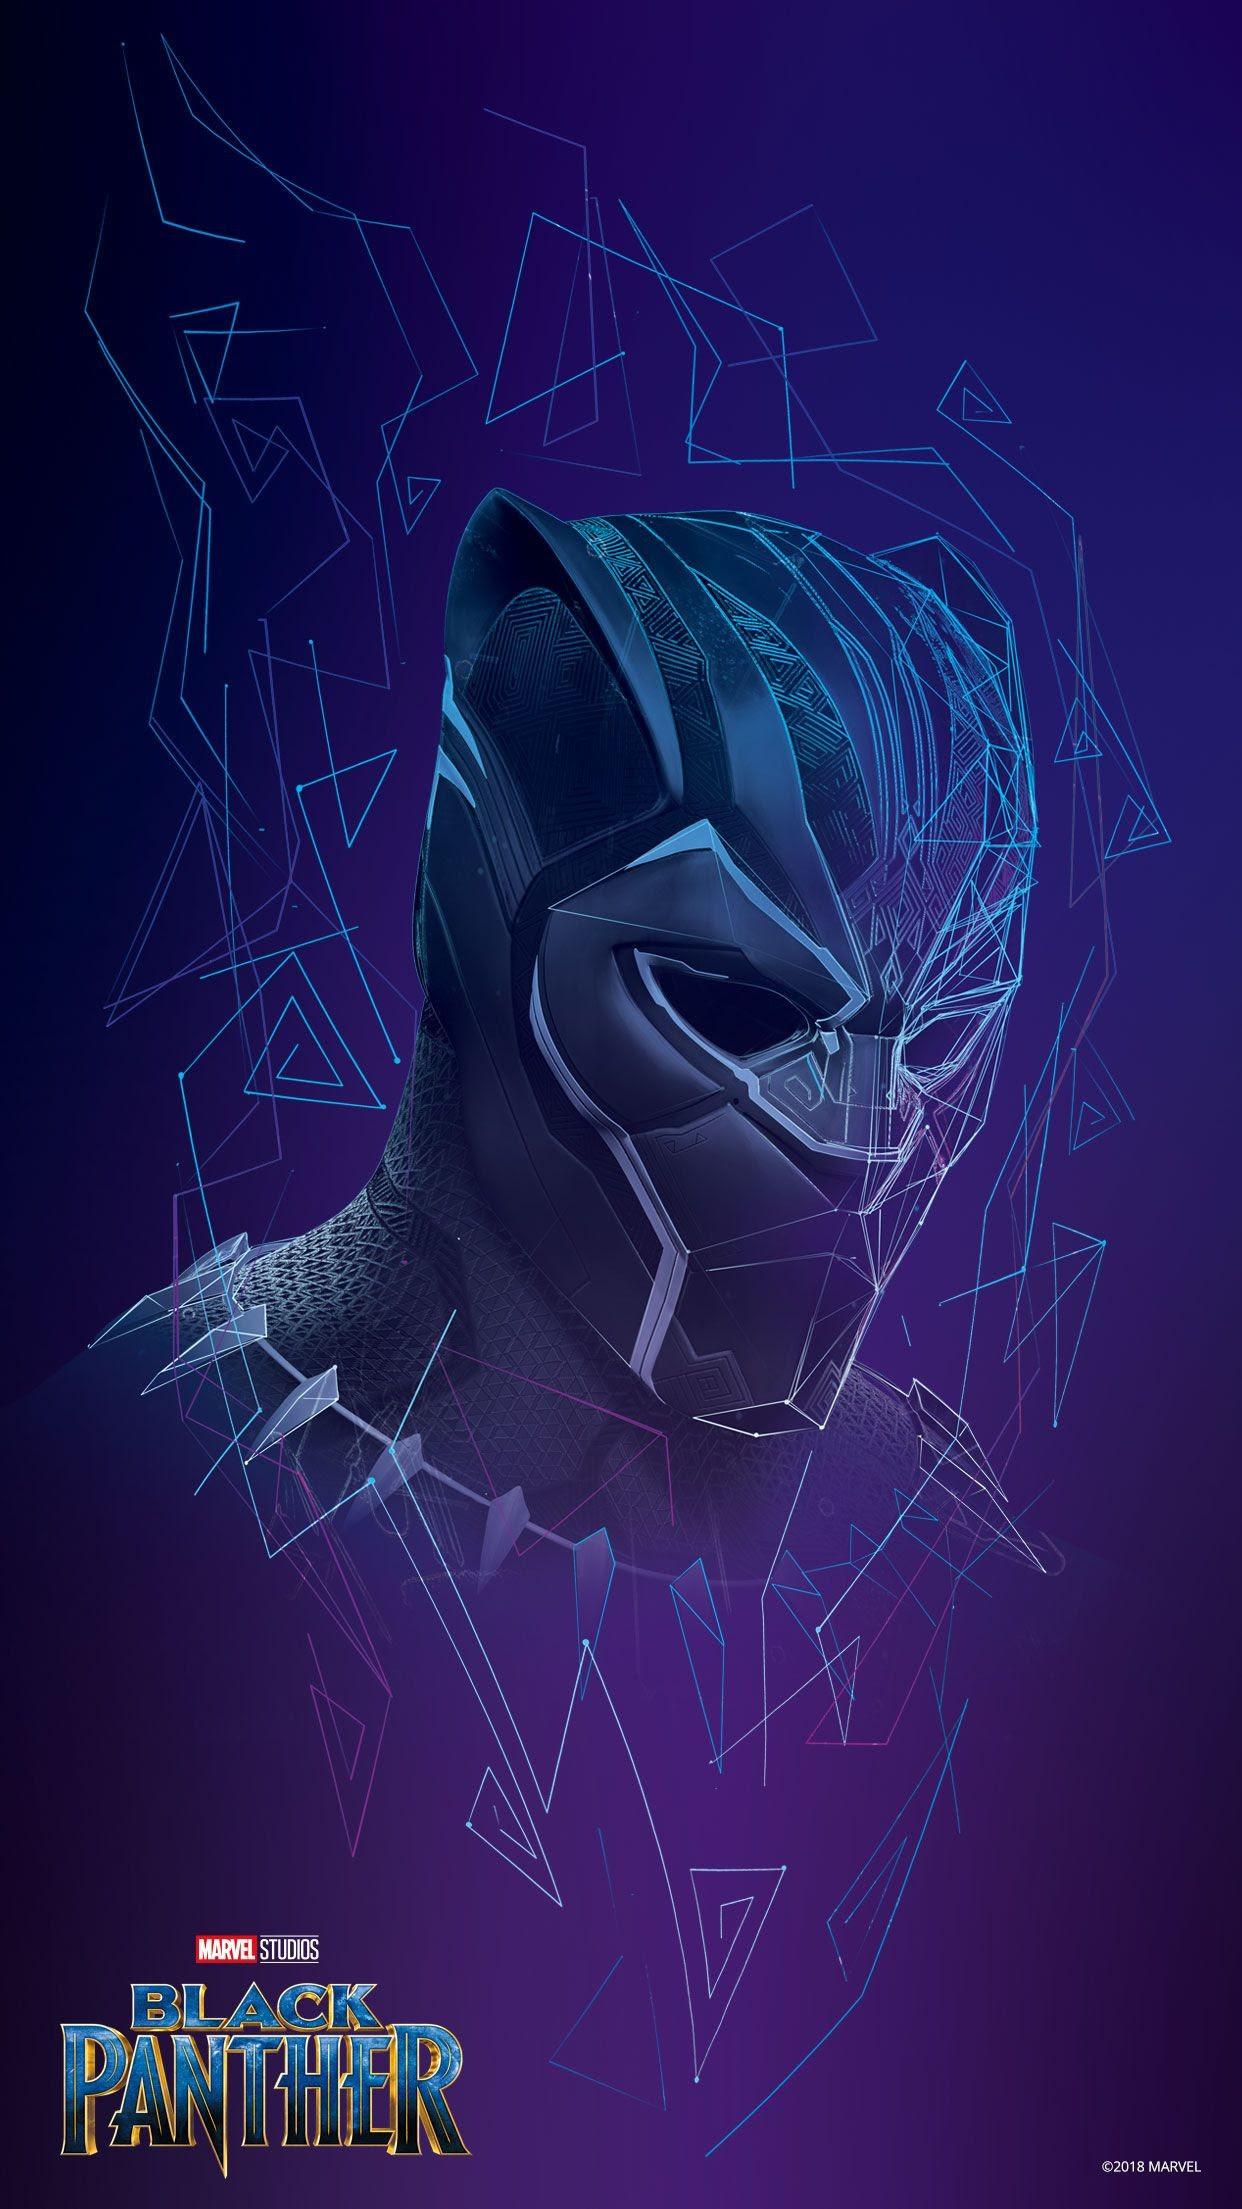 Black Panther Ancestral Plane Wallpaper : black, panther, ancestral, plane, wallpaper, Background, Black, Panther, Ancestral, Plane, Wallpaper